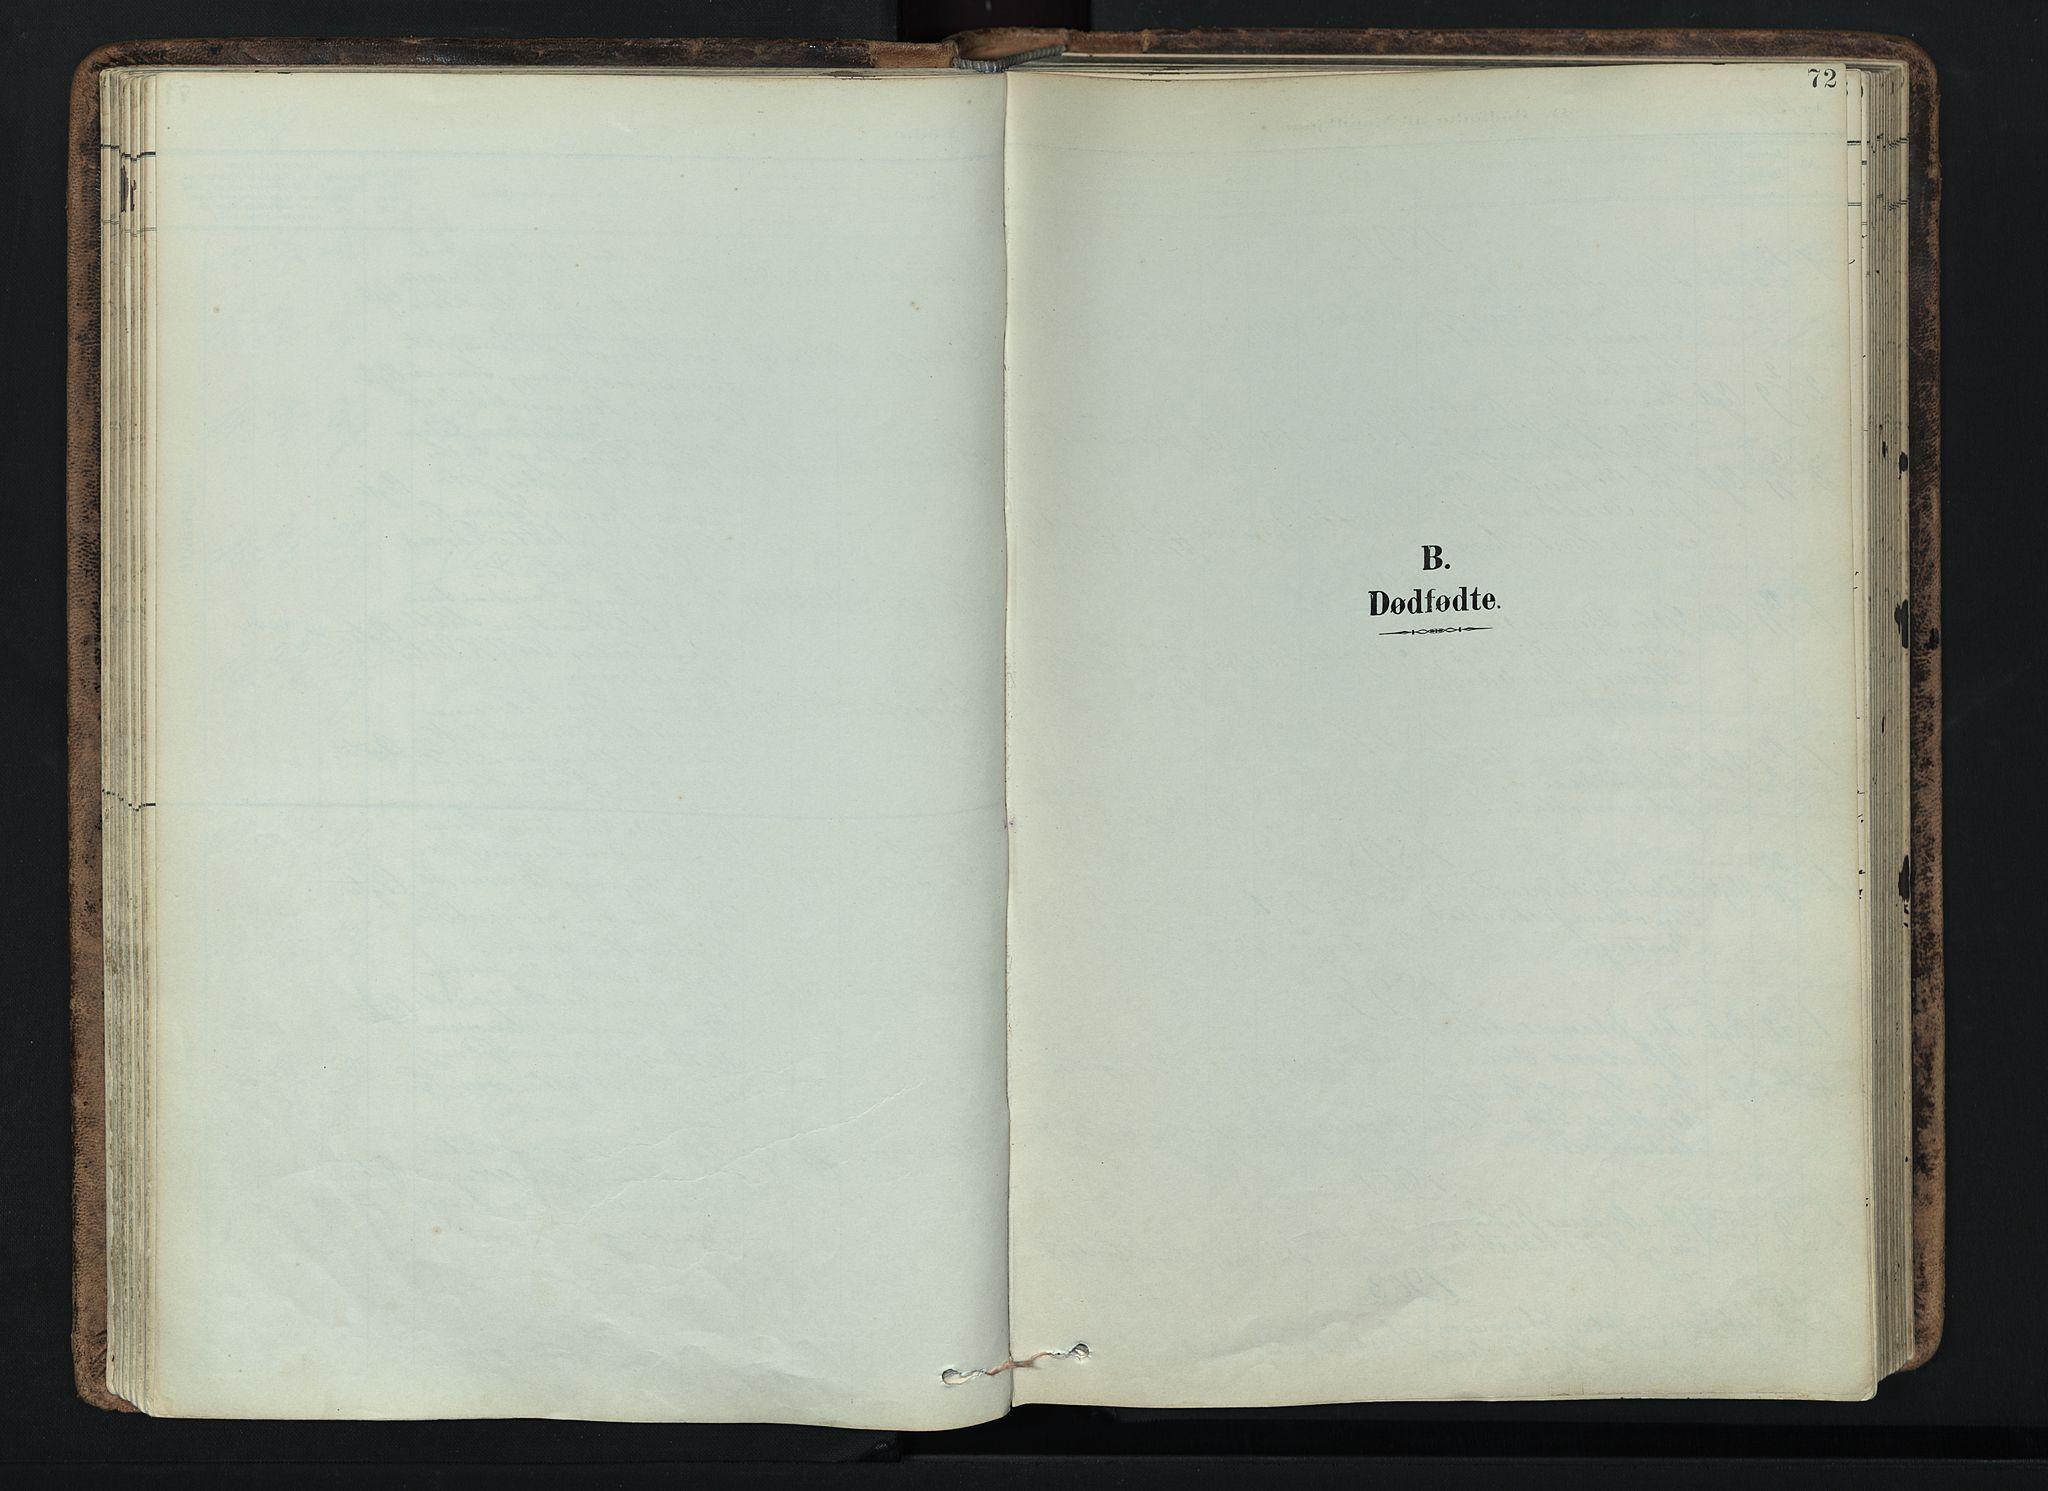 SAH, Vardal prestekontor, H/Ha/Haa/L0019: Ministerialbok nr. 19, 1893-1907, s. 72